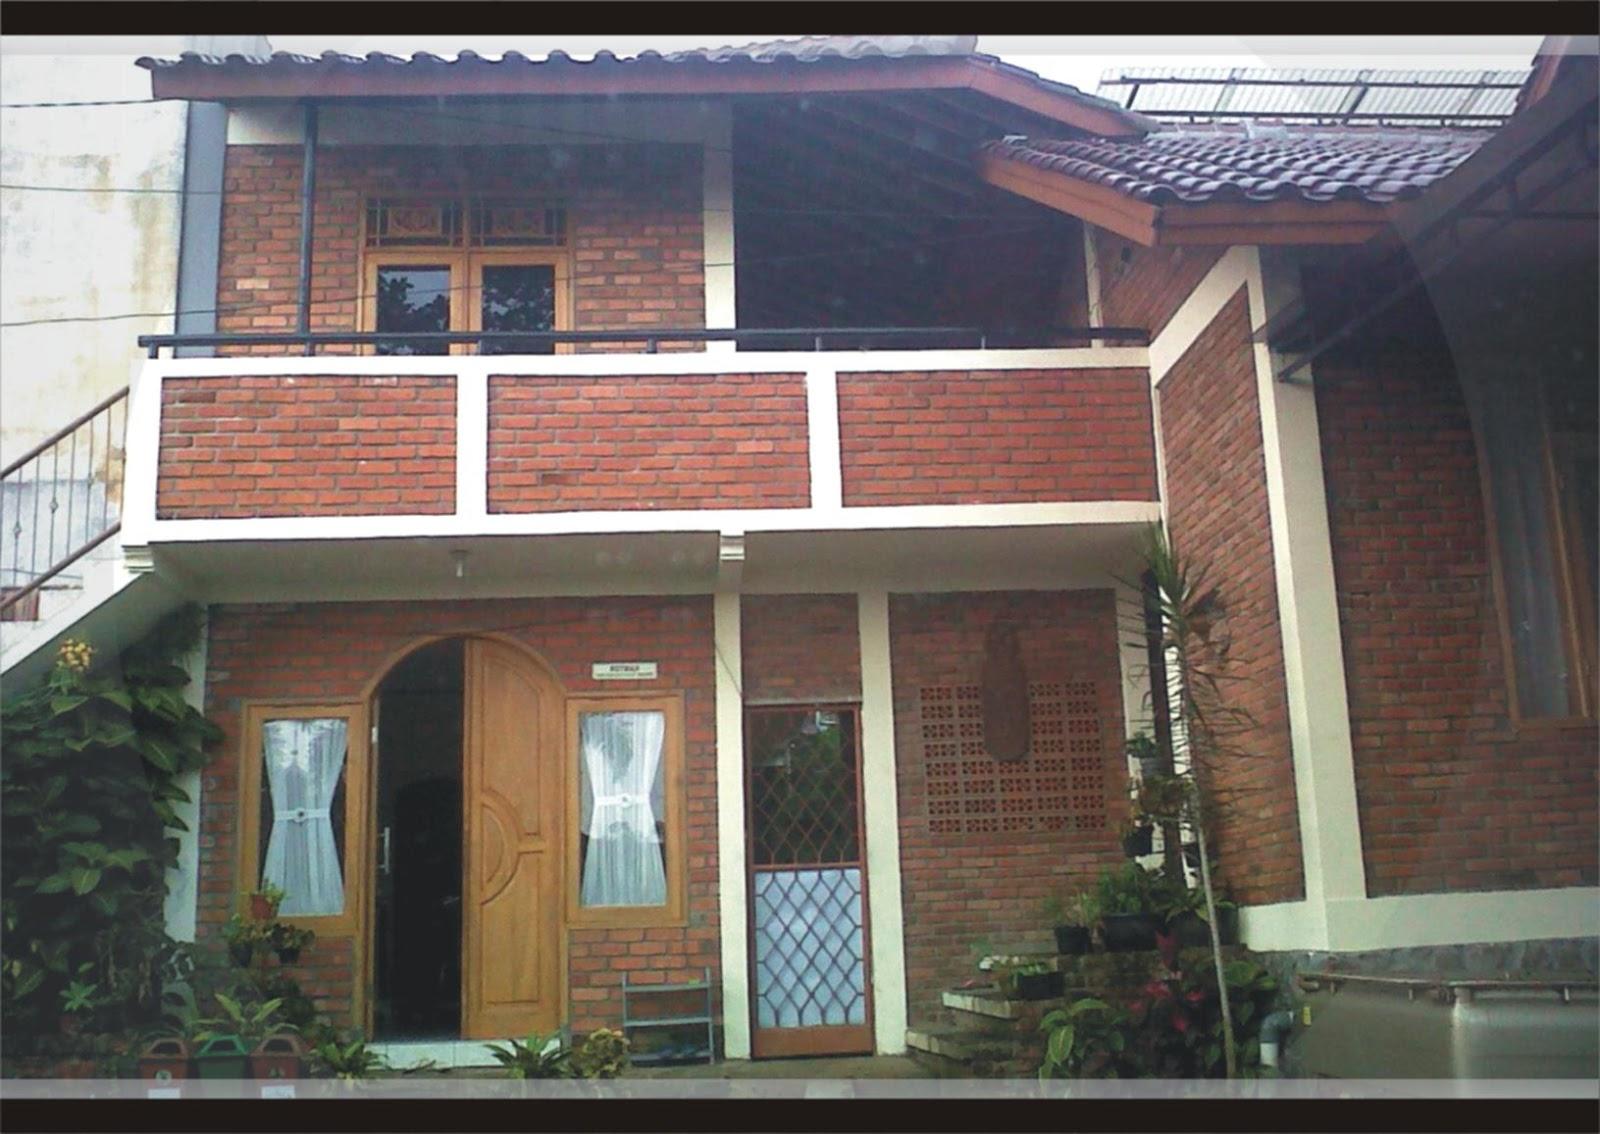 3 Gambar Rumah Minimalis Bata Ekspos & 3 Gambar Rumah Minimalis Bata Ekspos | rumah-minimalis-indah